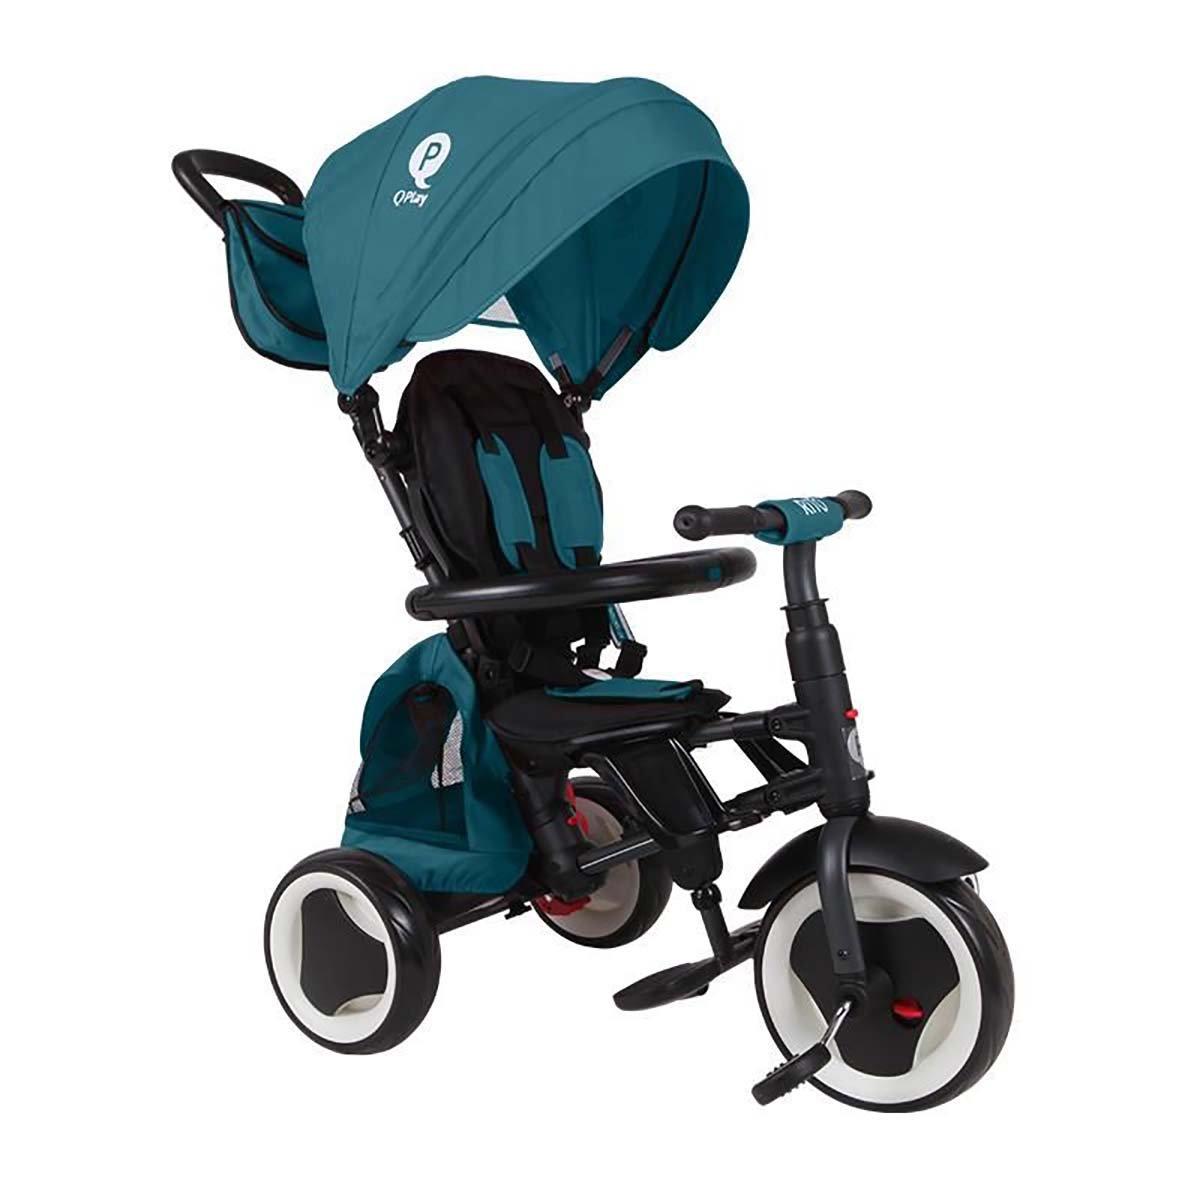 Tricicleta pliabila Qplay Rito Plus, Turcoaz imagine